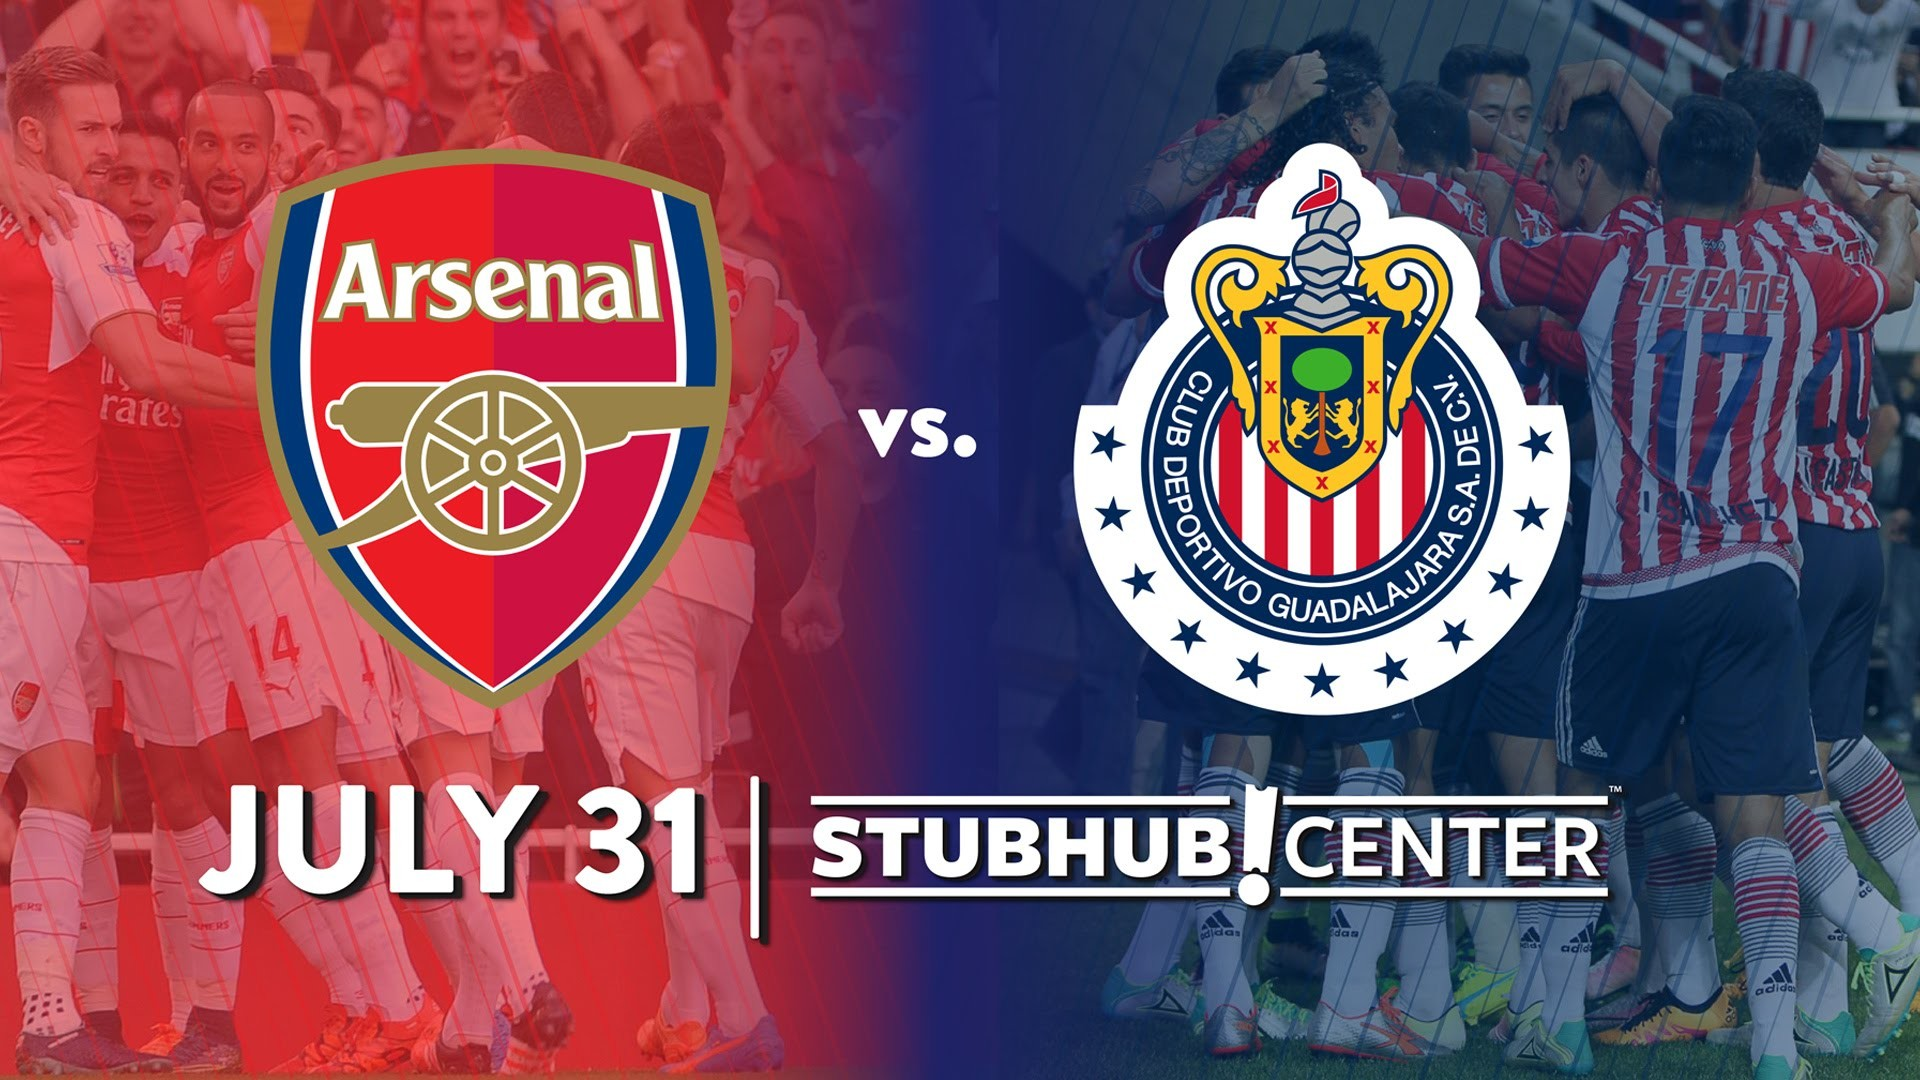 Chivas Guadalajara   July 31, 2016   StubHub Center – YouTube